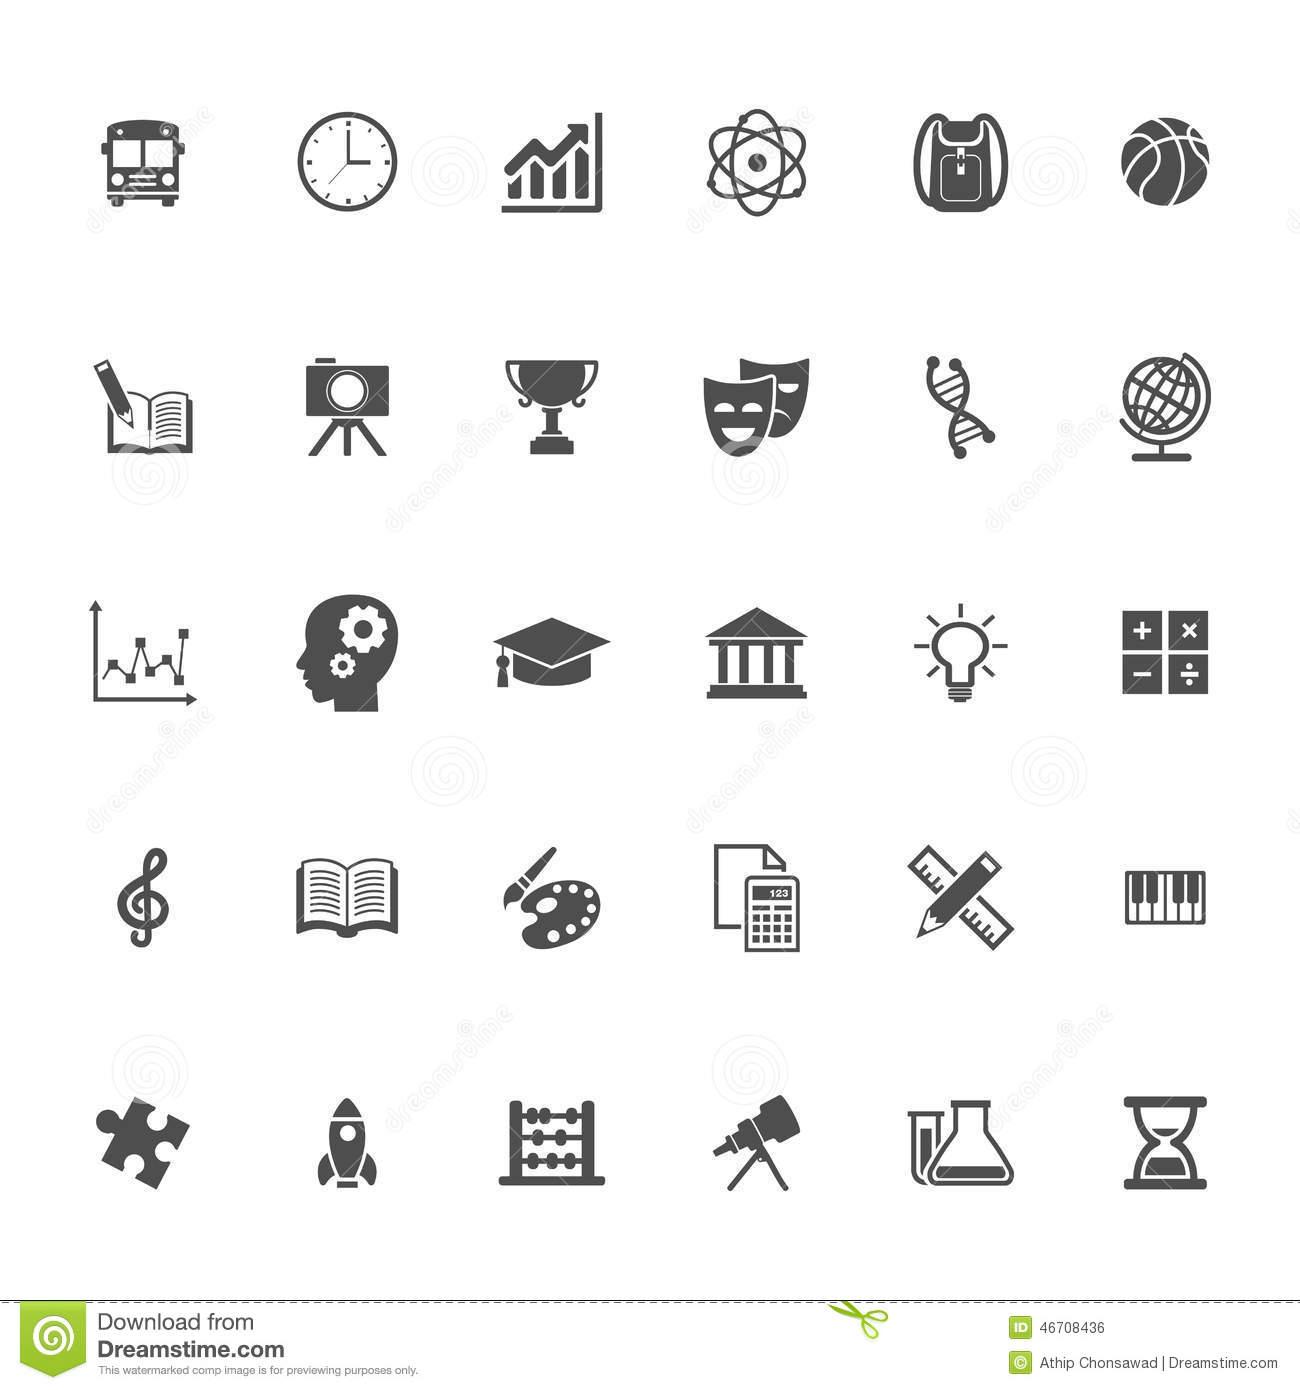 15 Education Subjects Icon Set Images